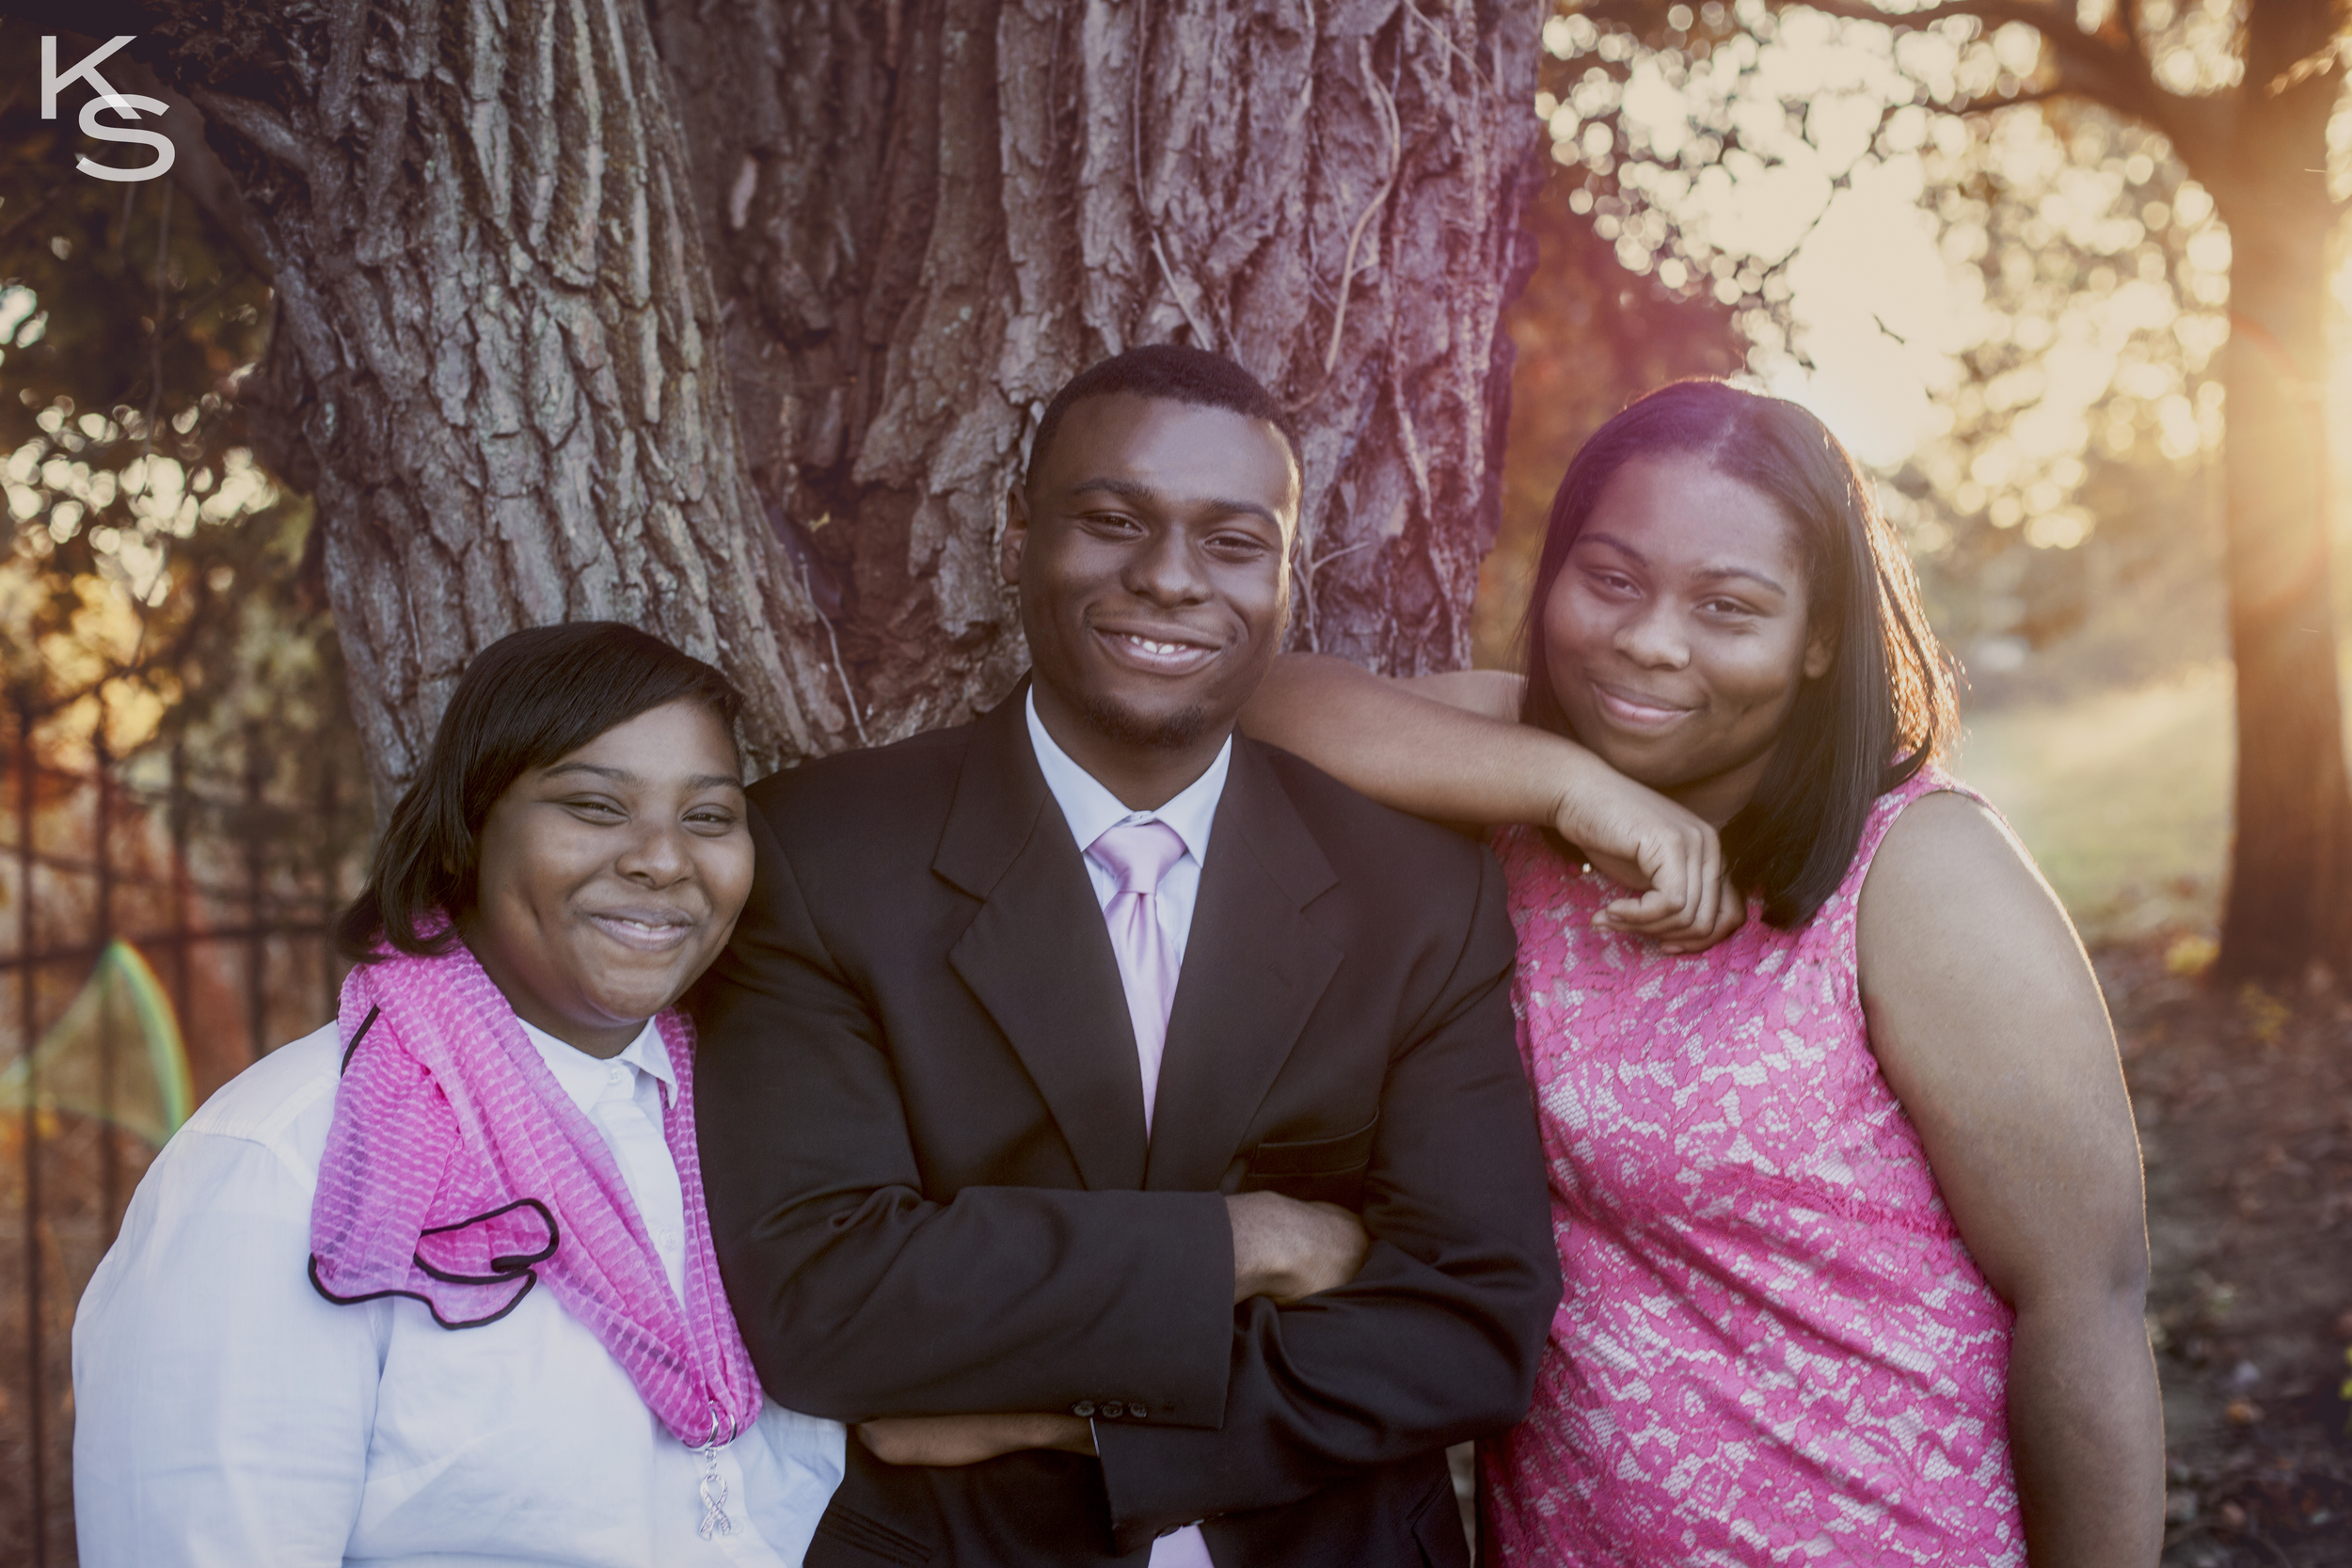 Fields Family - Portraits - K. Stoddard Photography 013.jpg